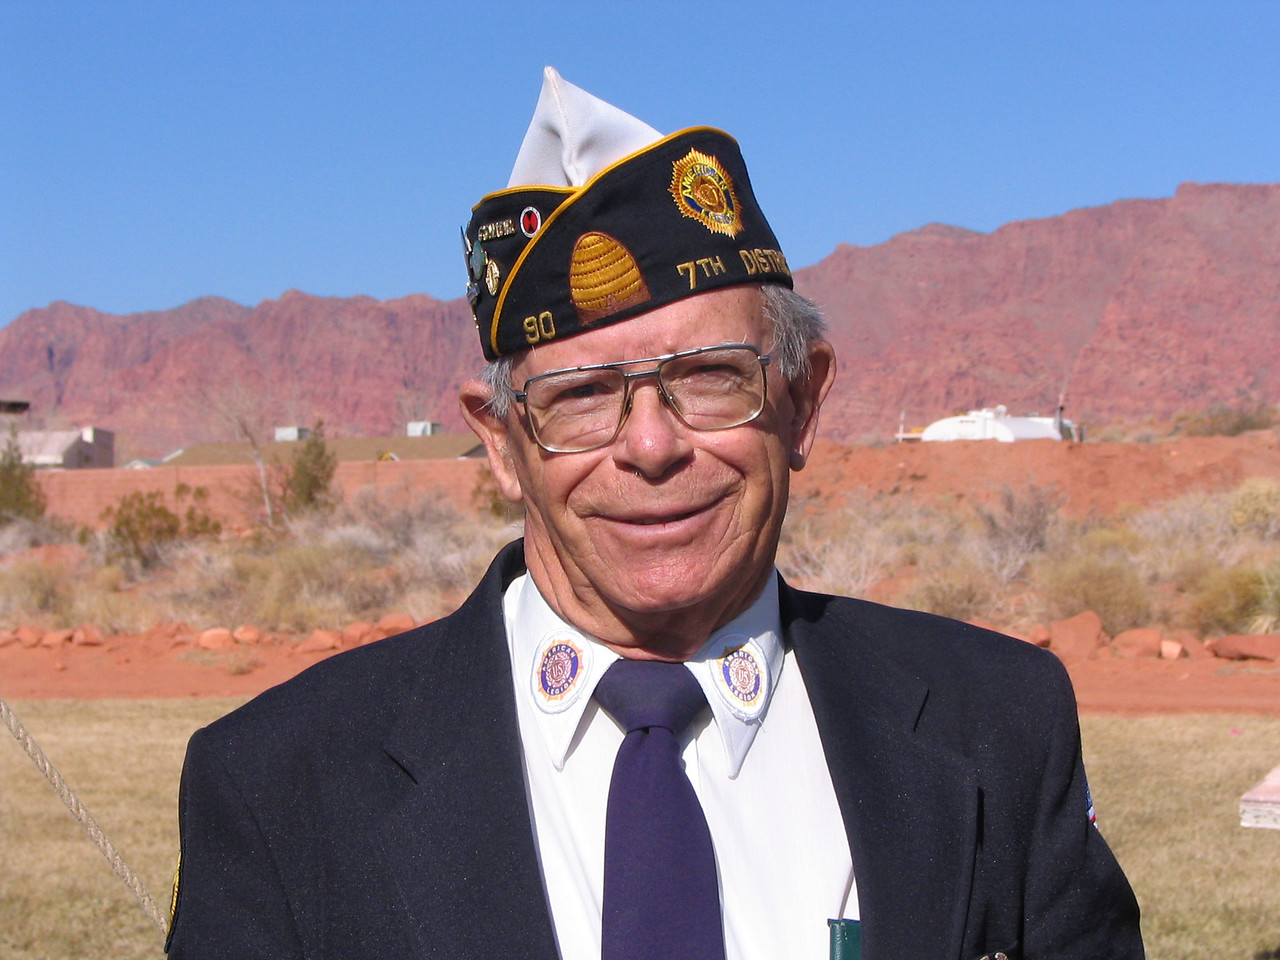 Lloyd Beardsly, Dist 7 Commander, Flag Detail, Tooter